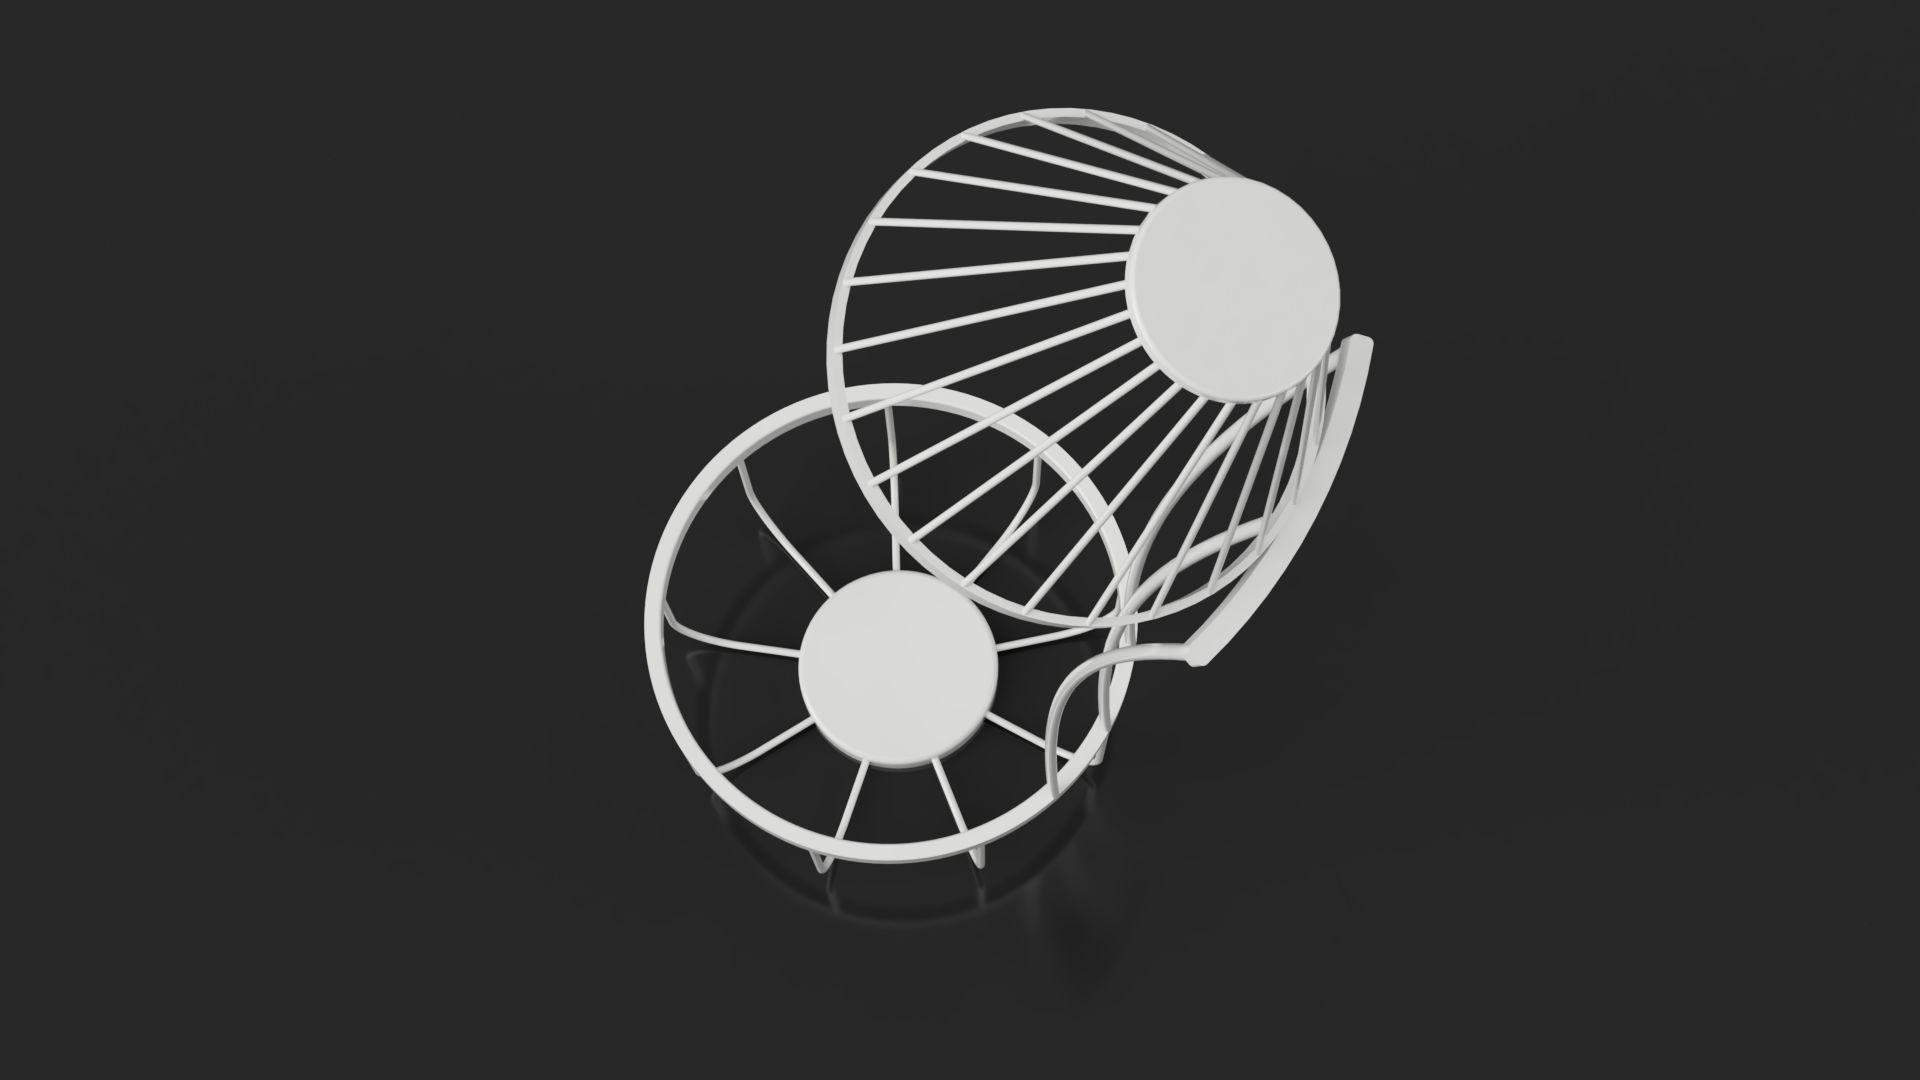 Lumini-apple-2019-mar-22-11-33-59pm-000-customizedview21734965384-png-3500-3500